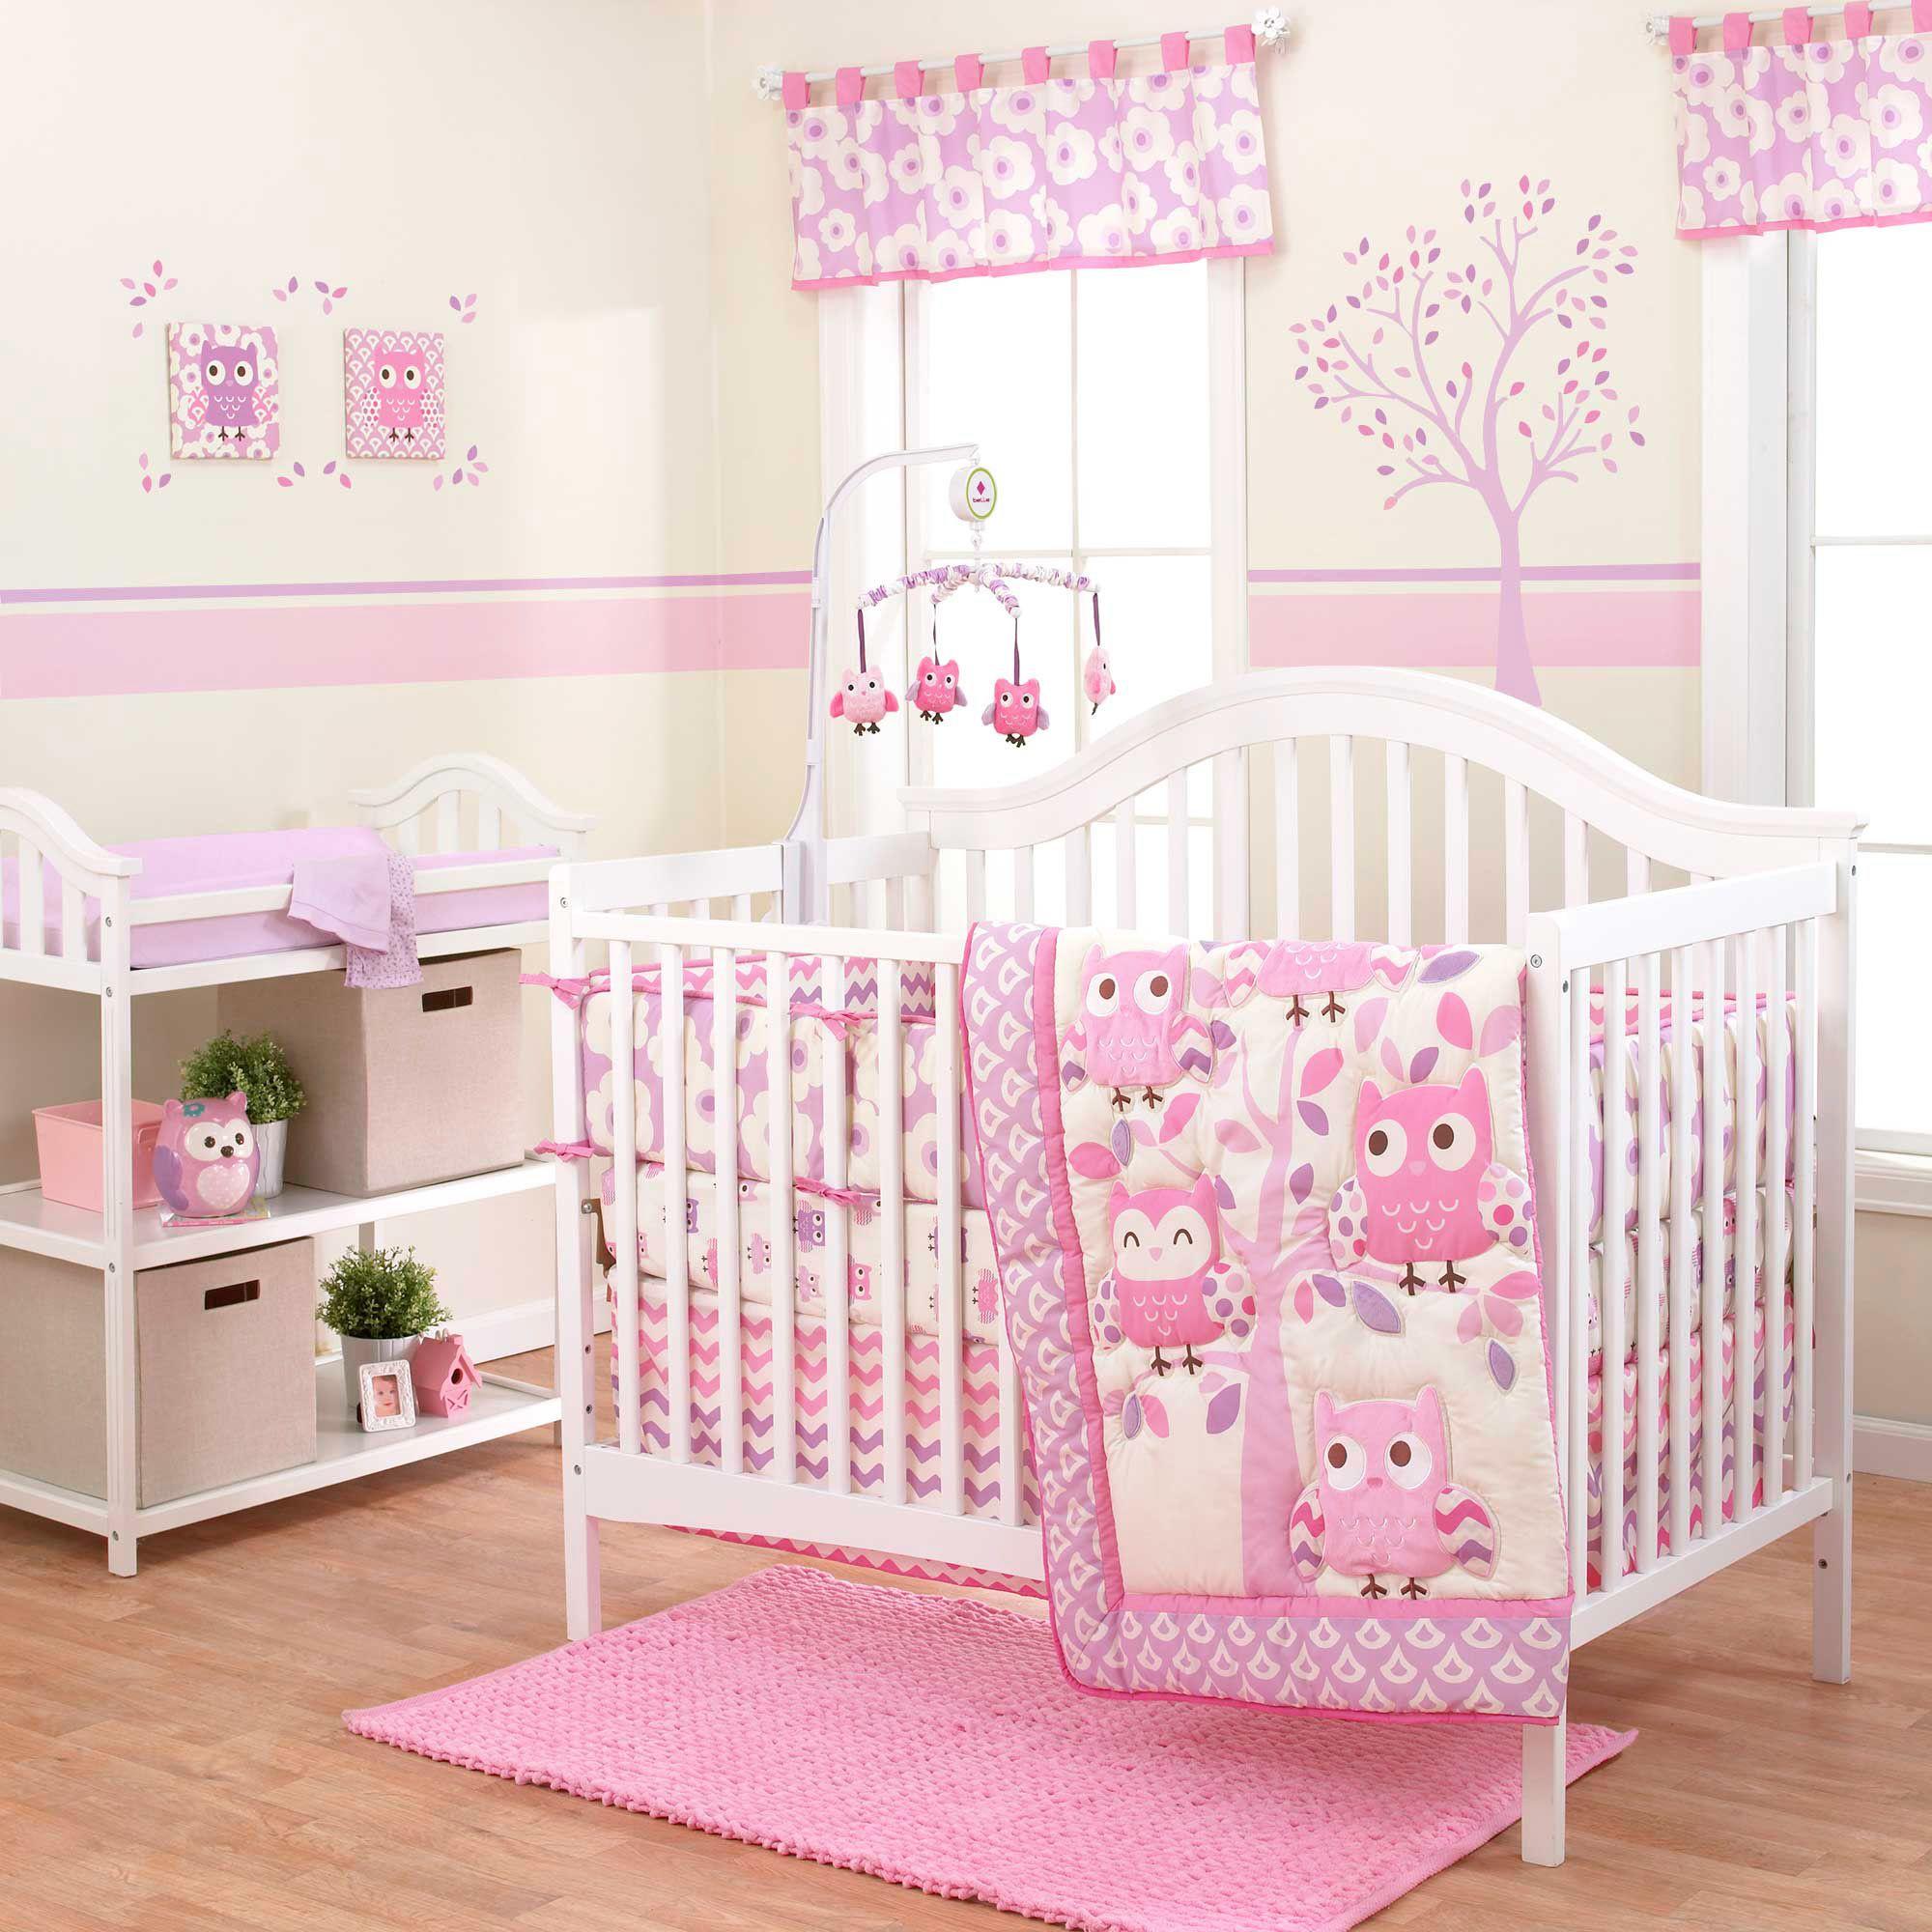 Dancing Owls Bedding By Belle Owl Baby Crib Bedding Bsbldo Set